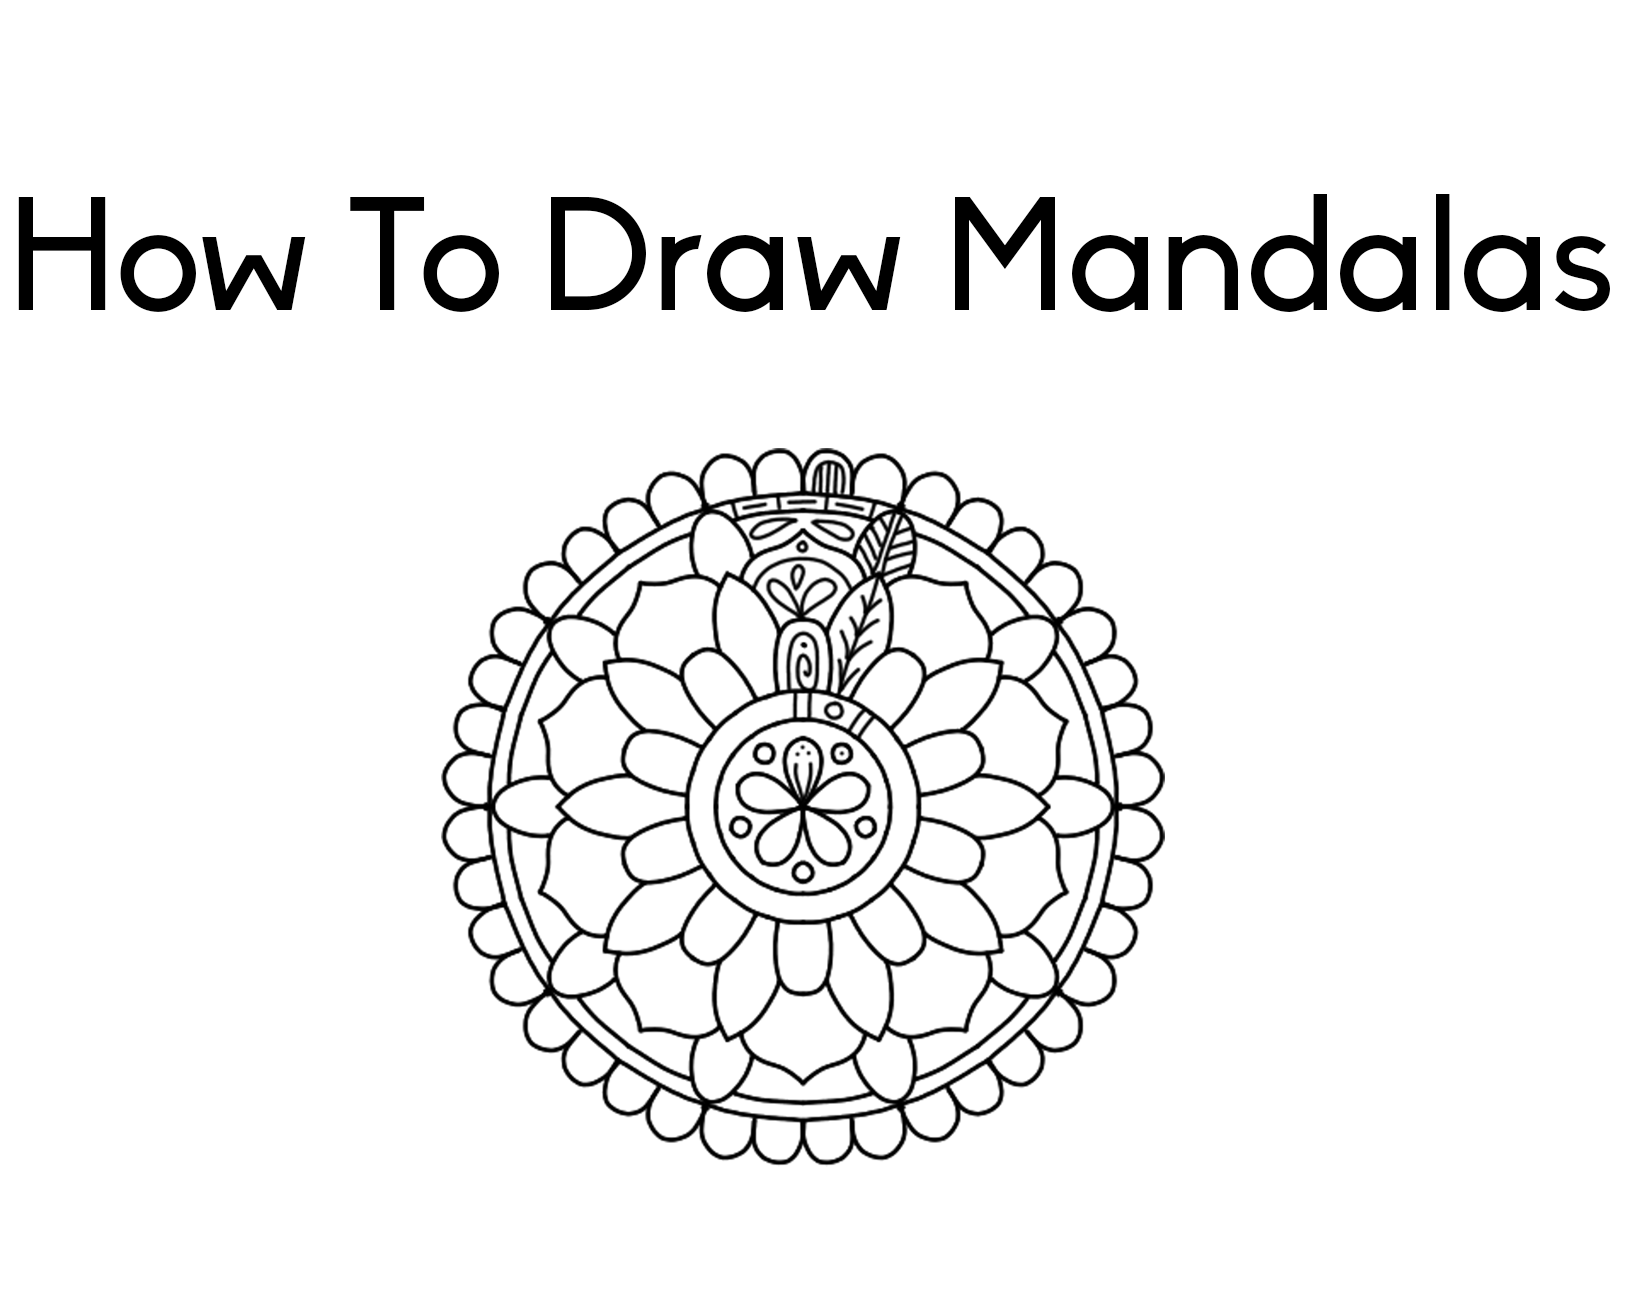 How To Draw Mandalas By Screwy Lightbulb